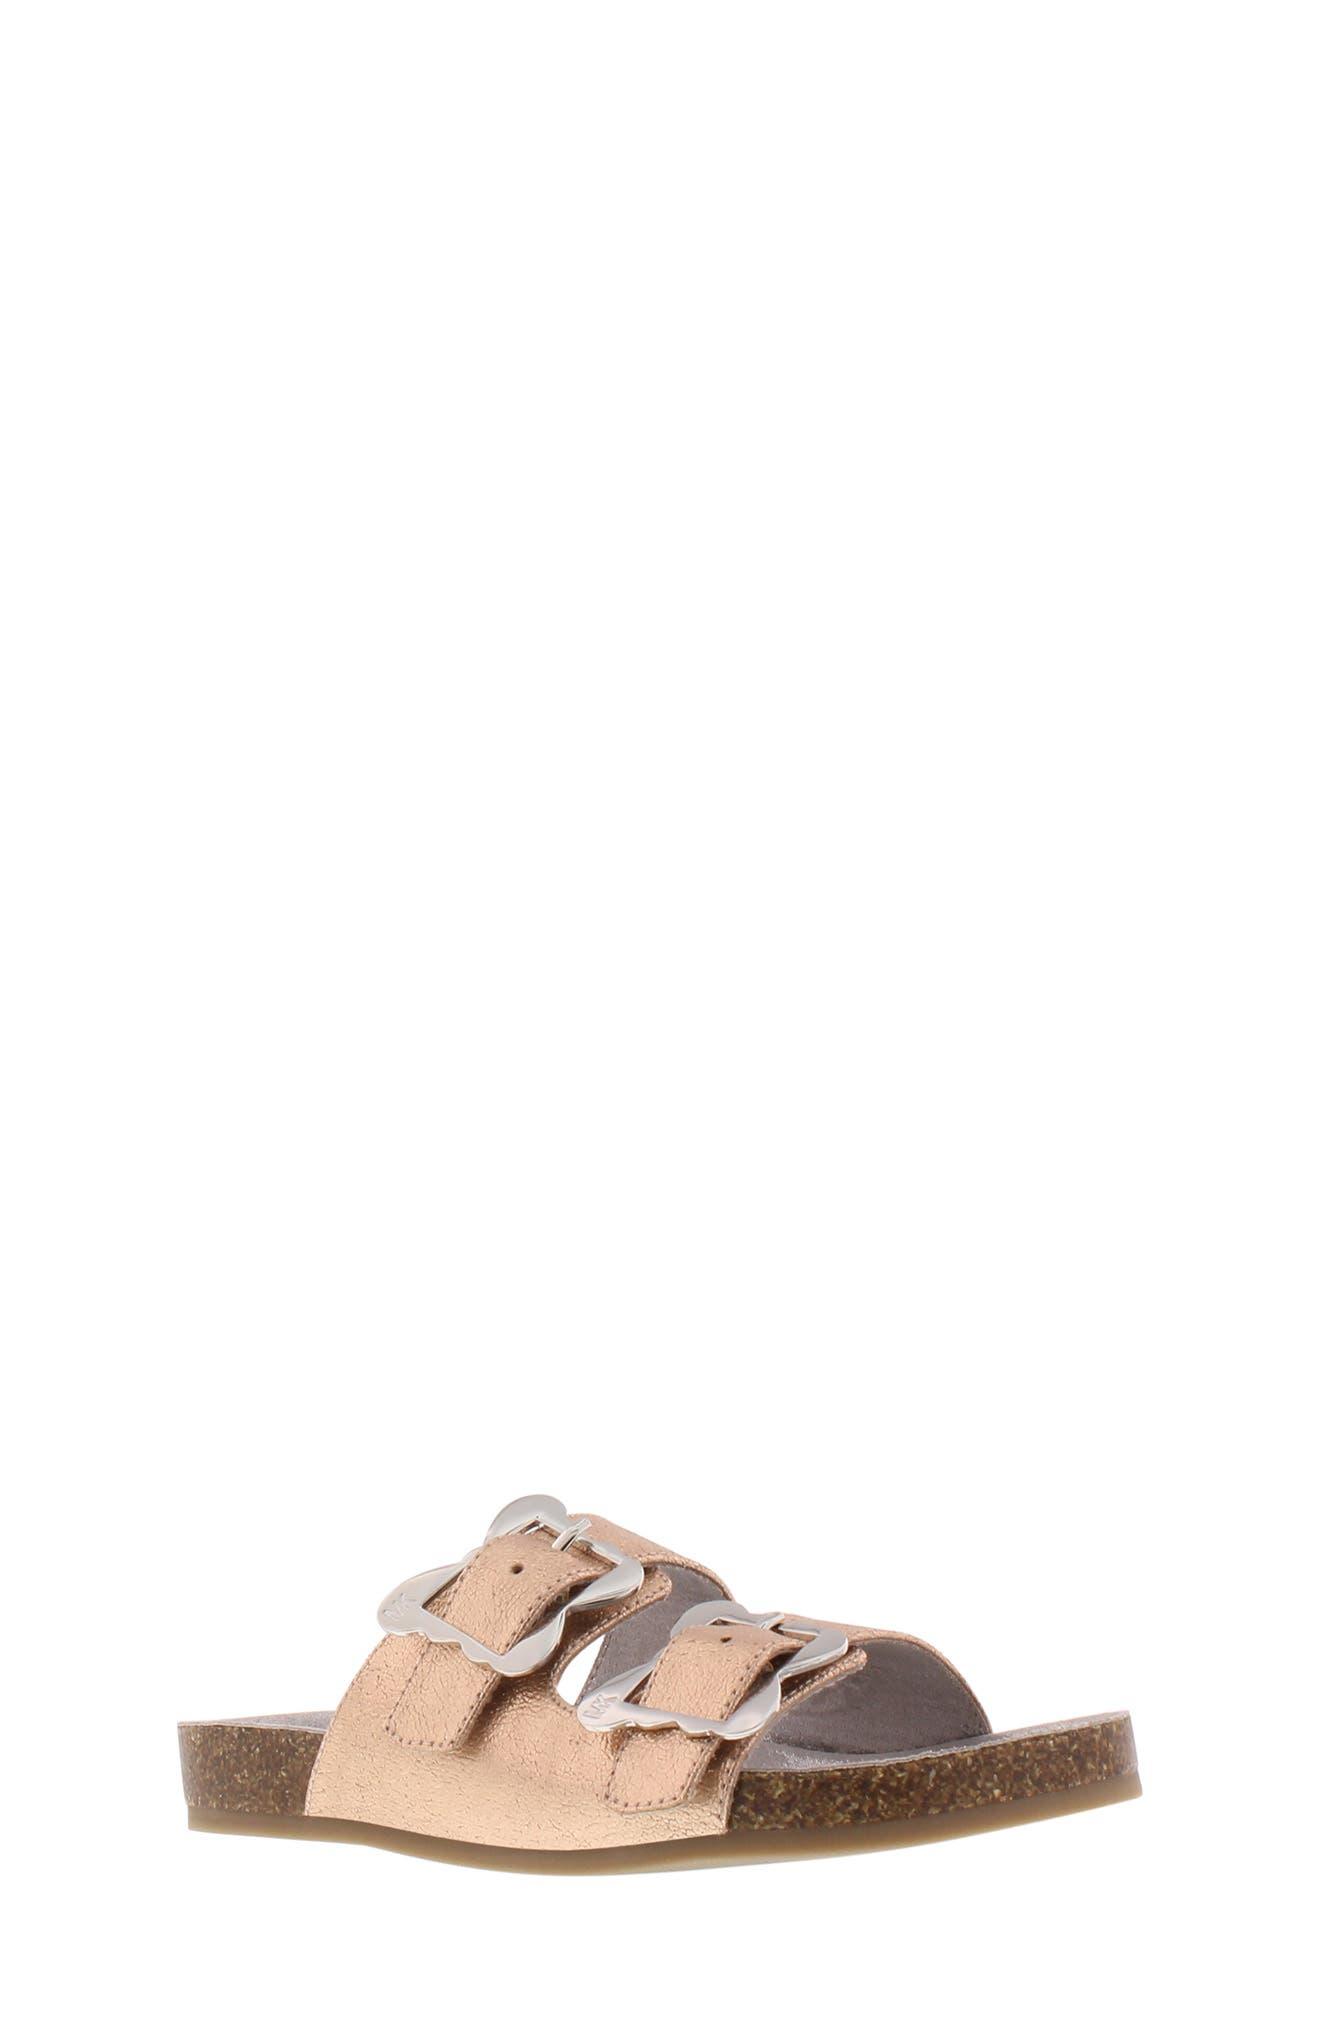 Ethel Chrysalis Slide Sandal, Main, color, ROSE GOLD 2